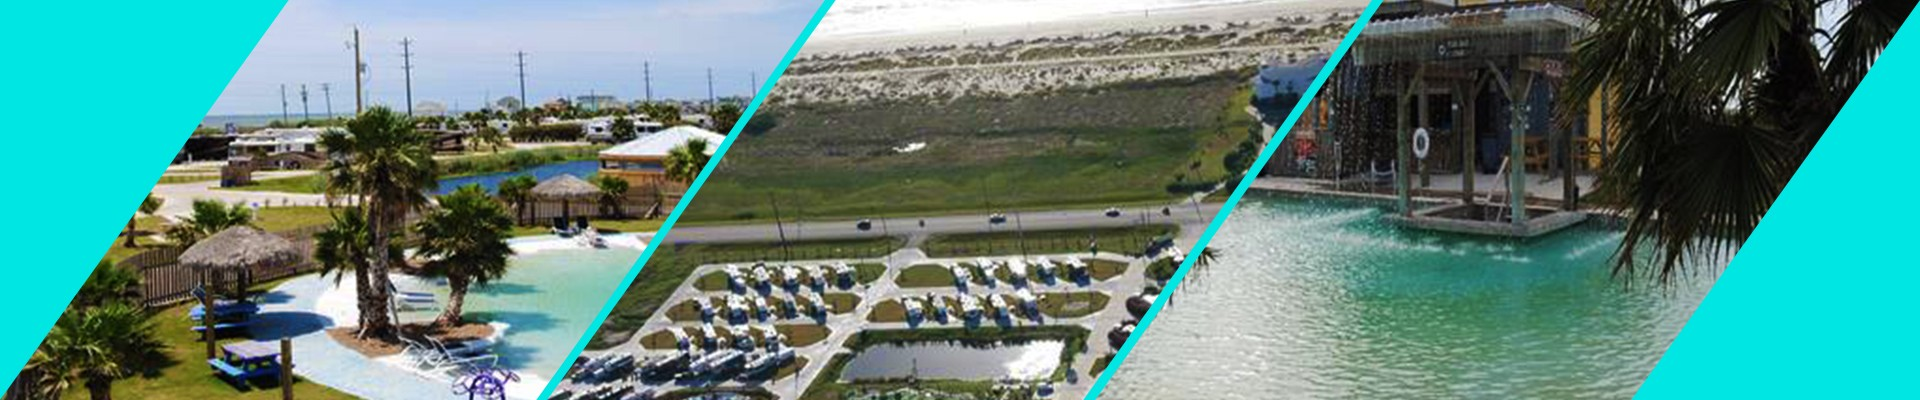 Jamaica Beach RV Resort in Galveston, Texas